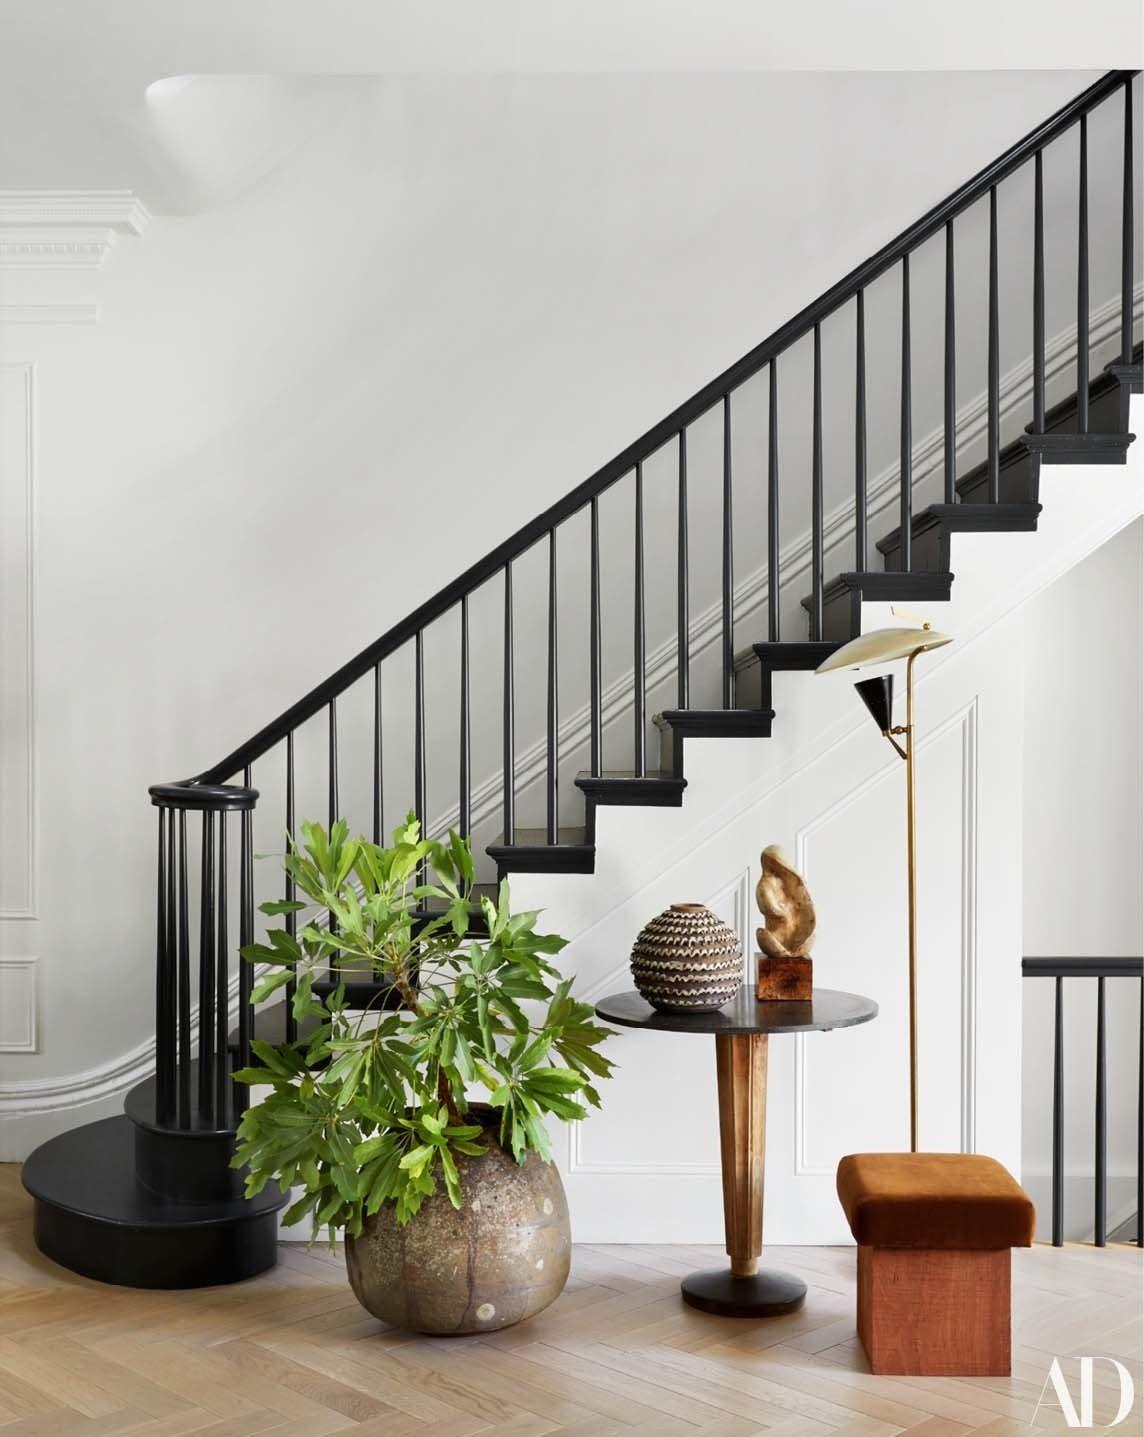 Design by  Elizabeth Roberts  via  Arch Digest